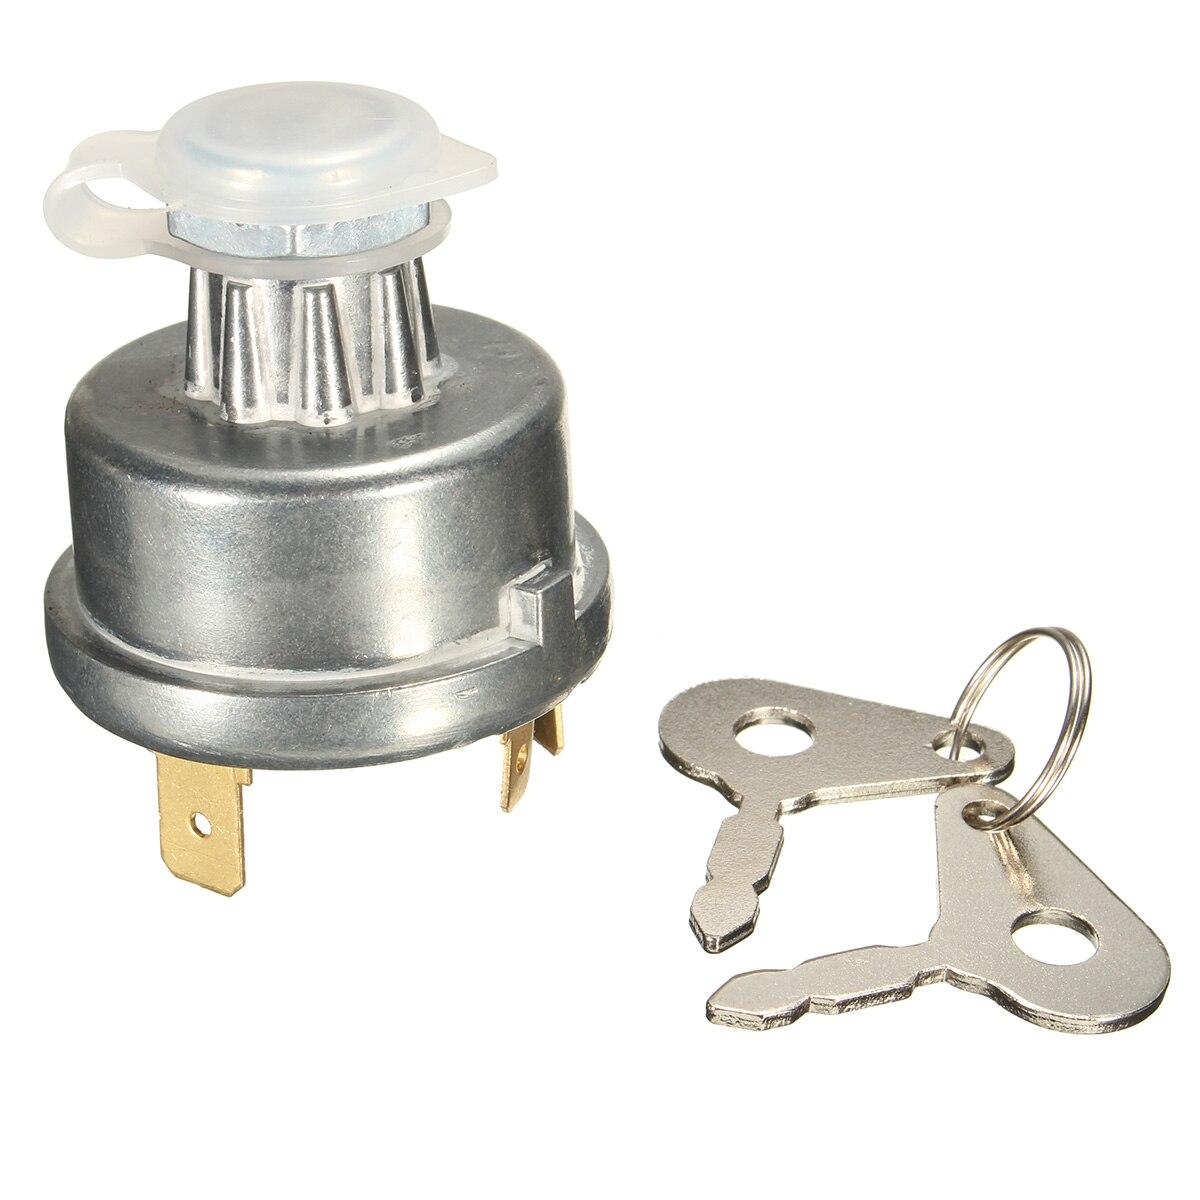 KSTE Reemplazo del Interruptor de Encendido y Bloqueo Keysfor Massey Ferguson 3699692M92